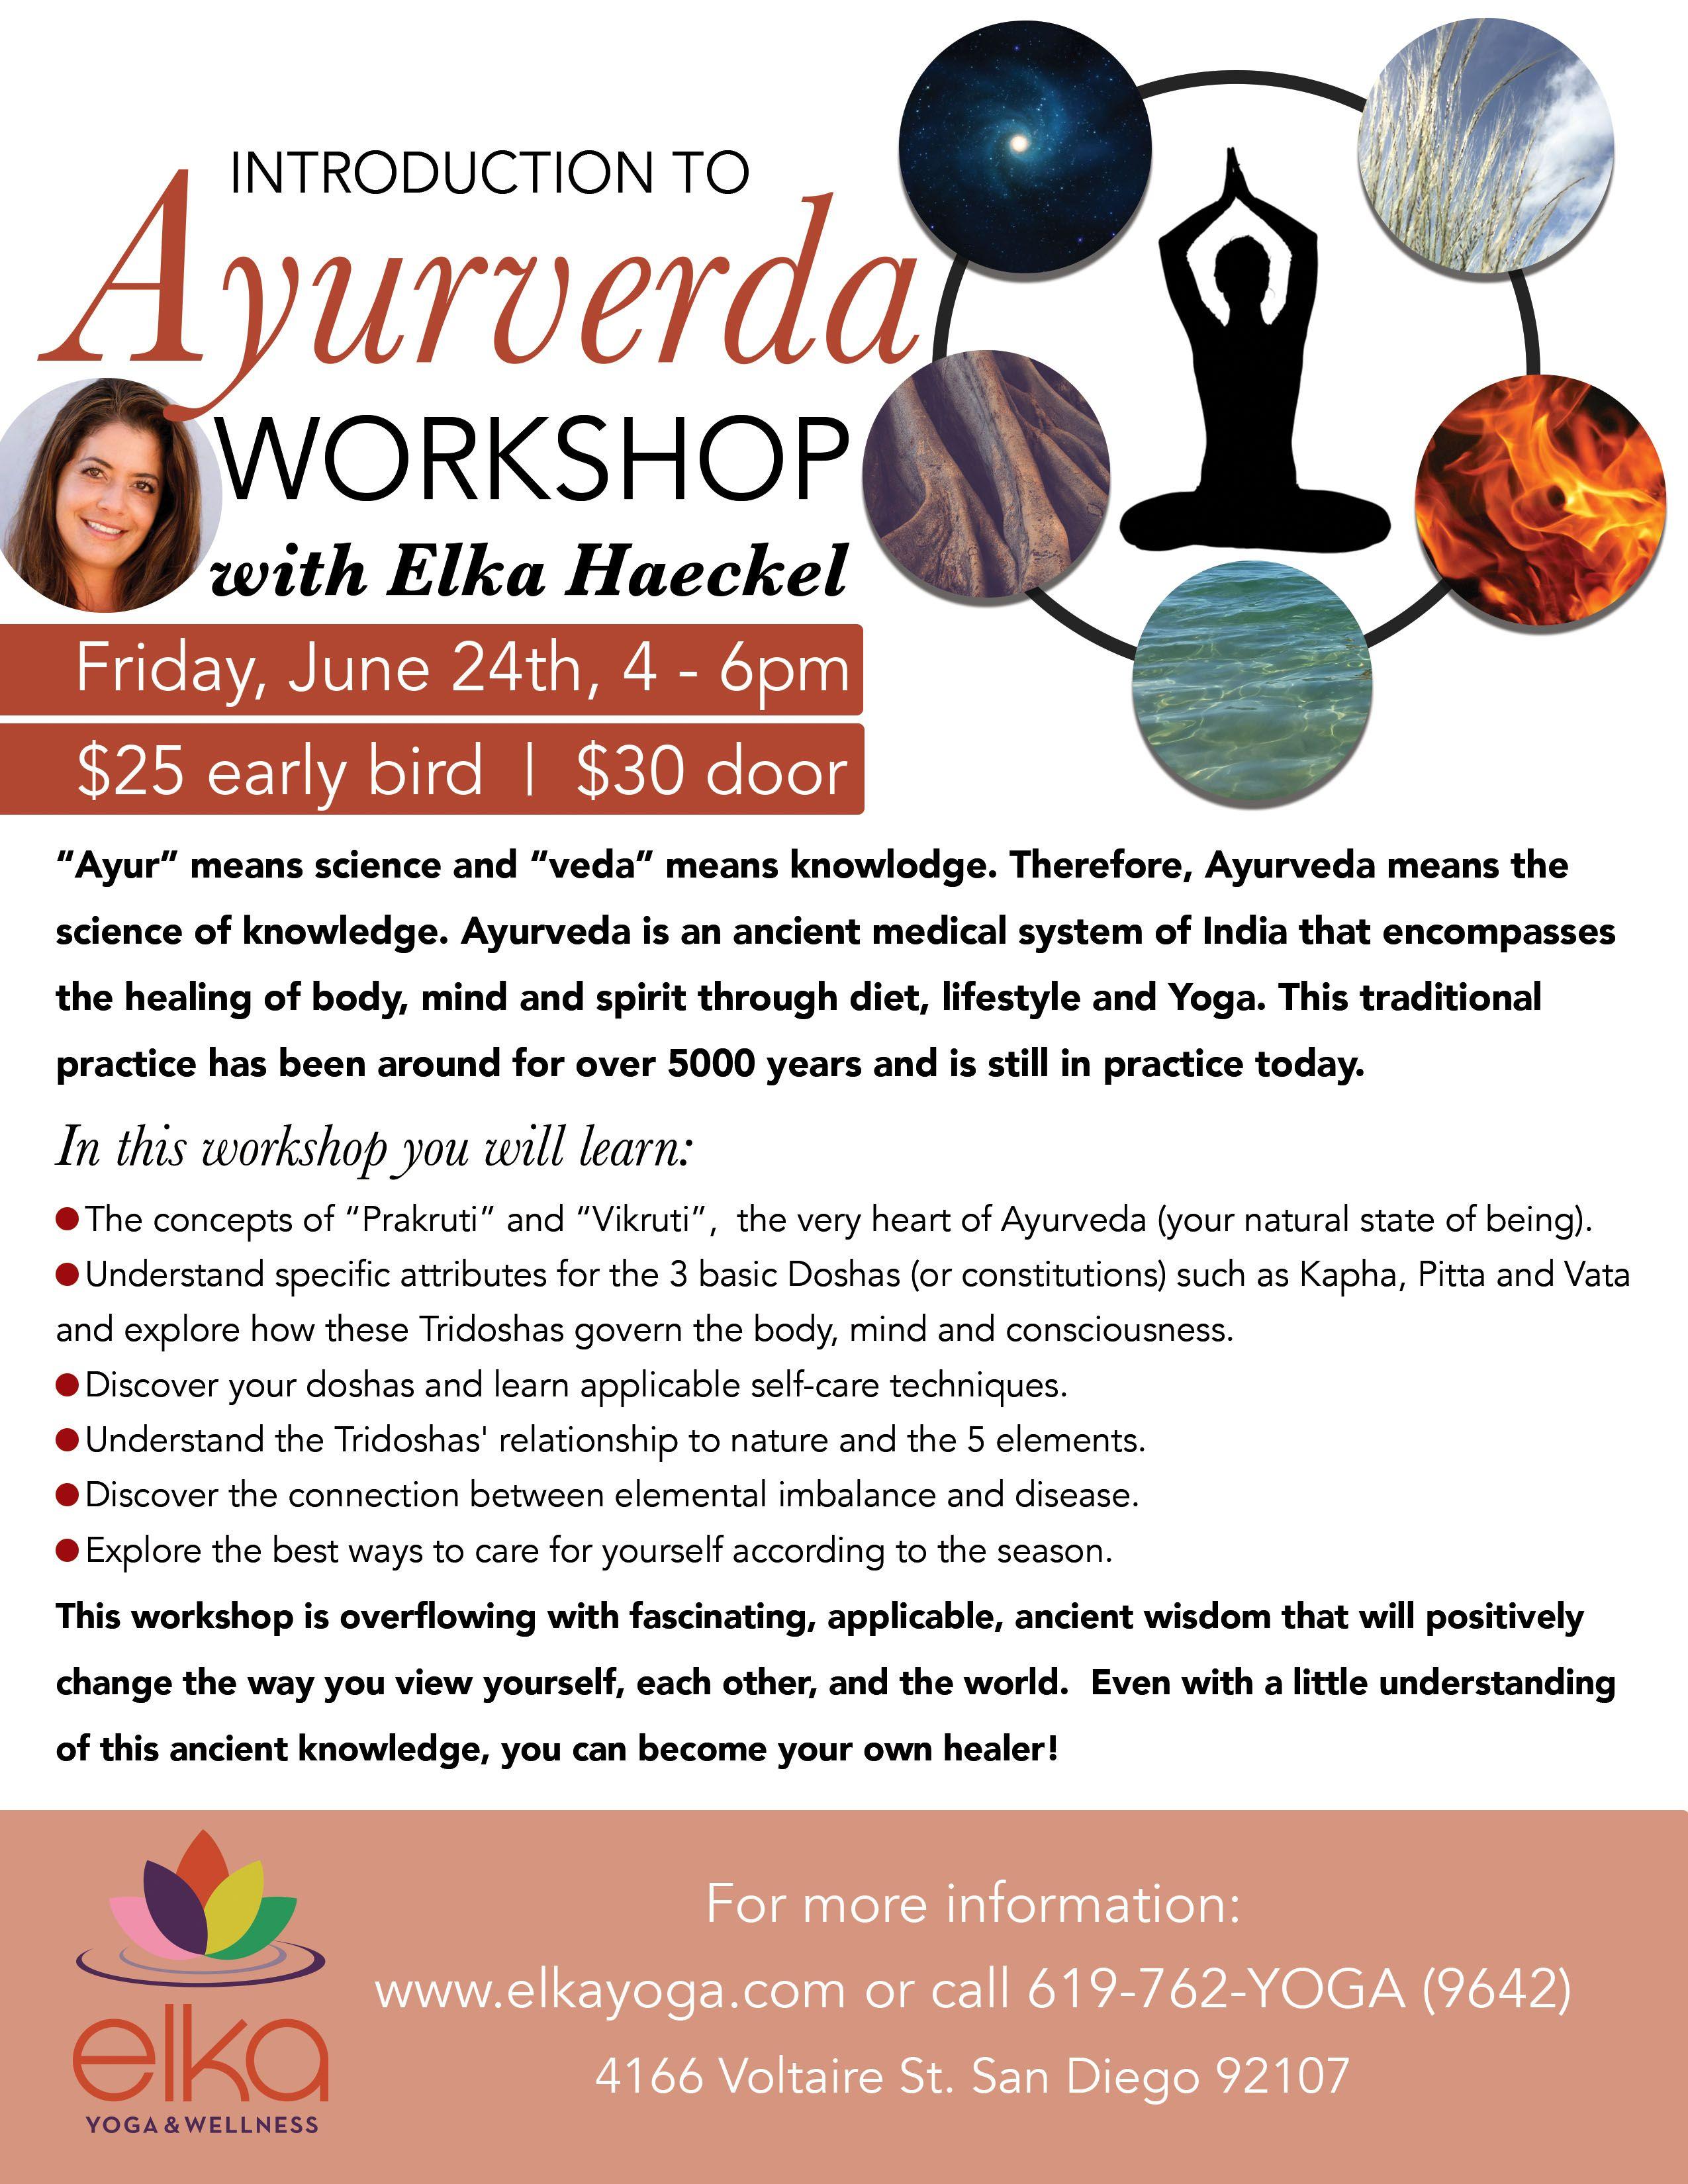 Ayurveda Workshop Flyer Design By Camila Badaro Client Elka Yoga And Wellness